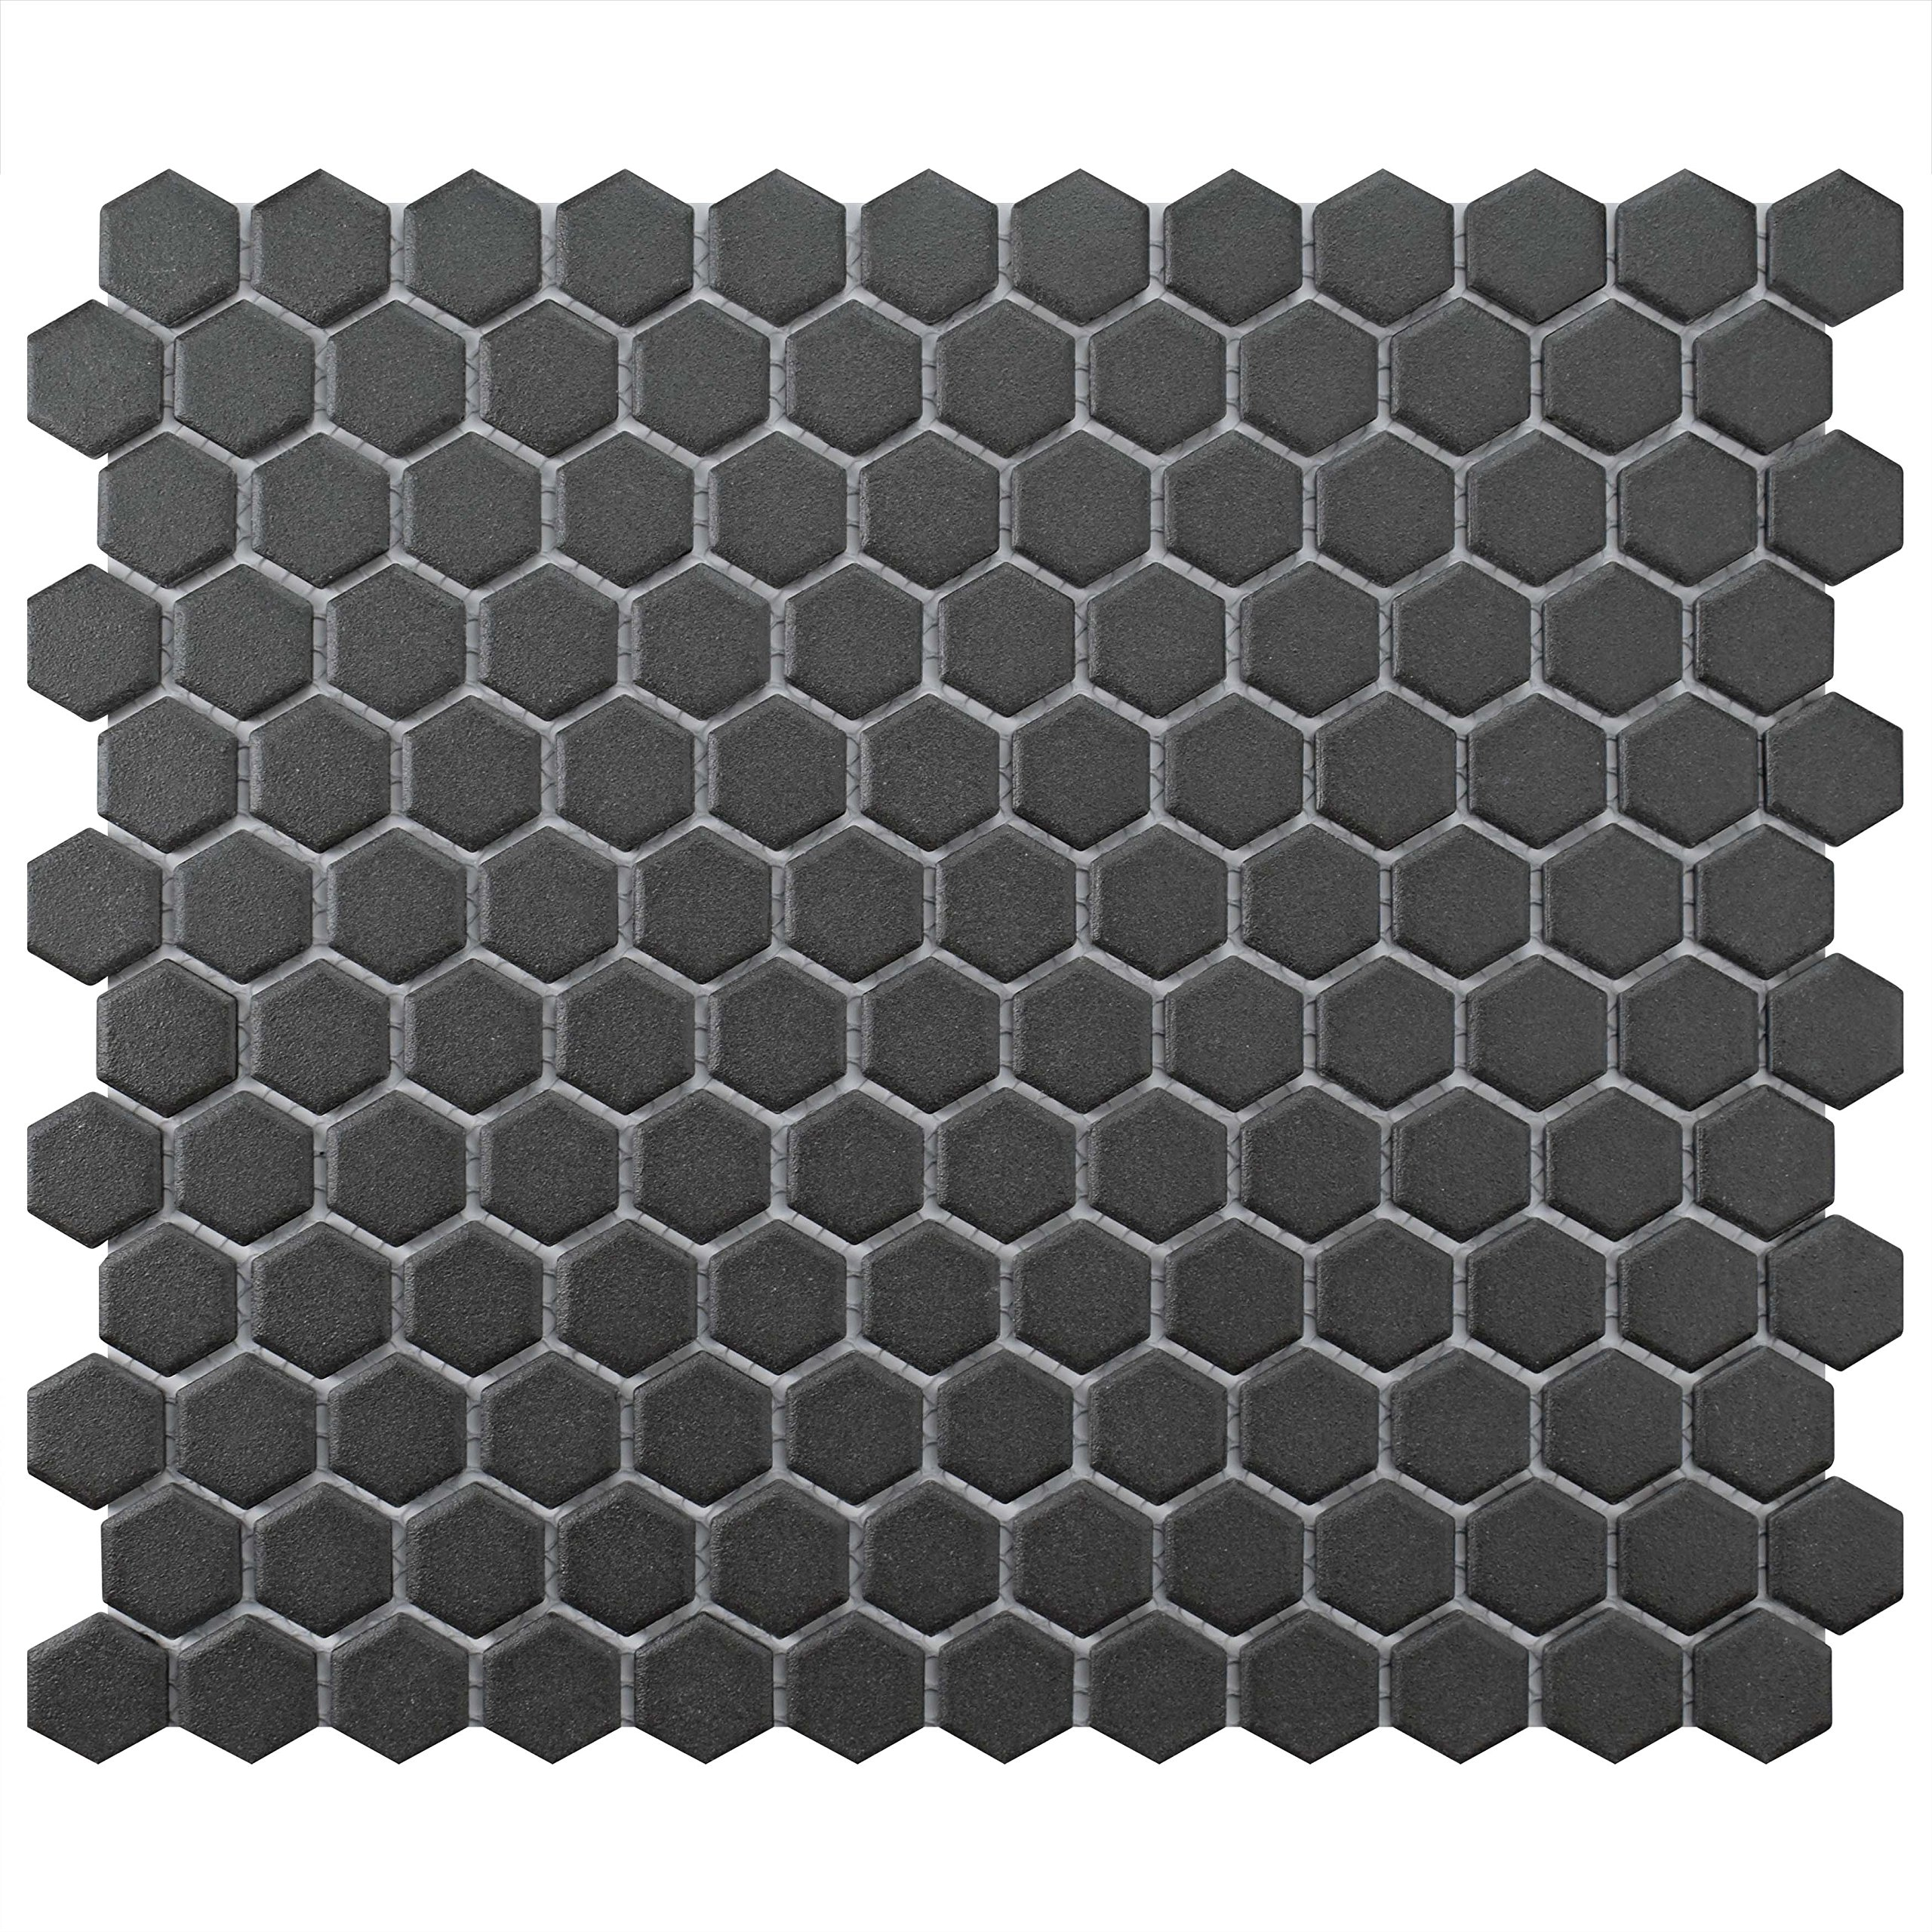 SomerTile FXLGHBK Antique Hex Porcelain Floor and Wall Tile, 10.25'' x 12'', Black